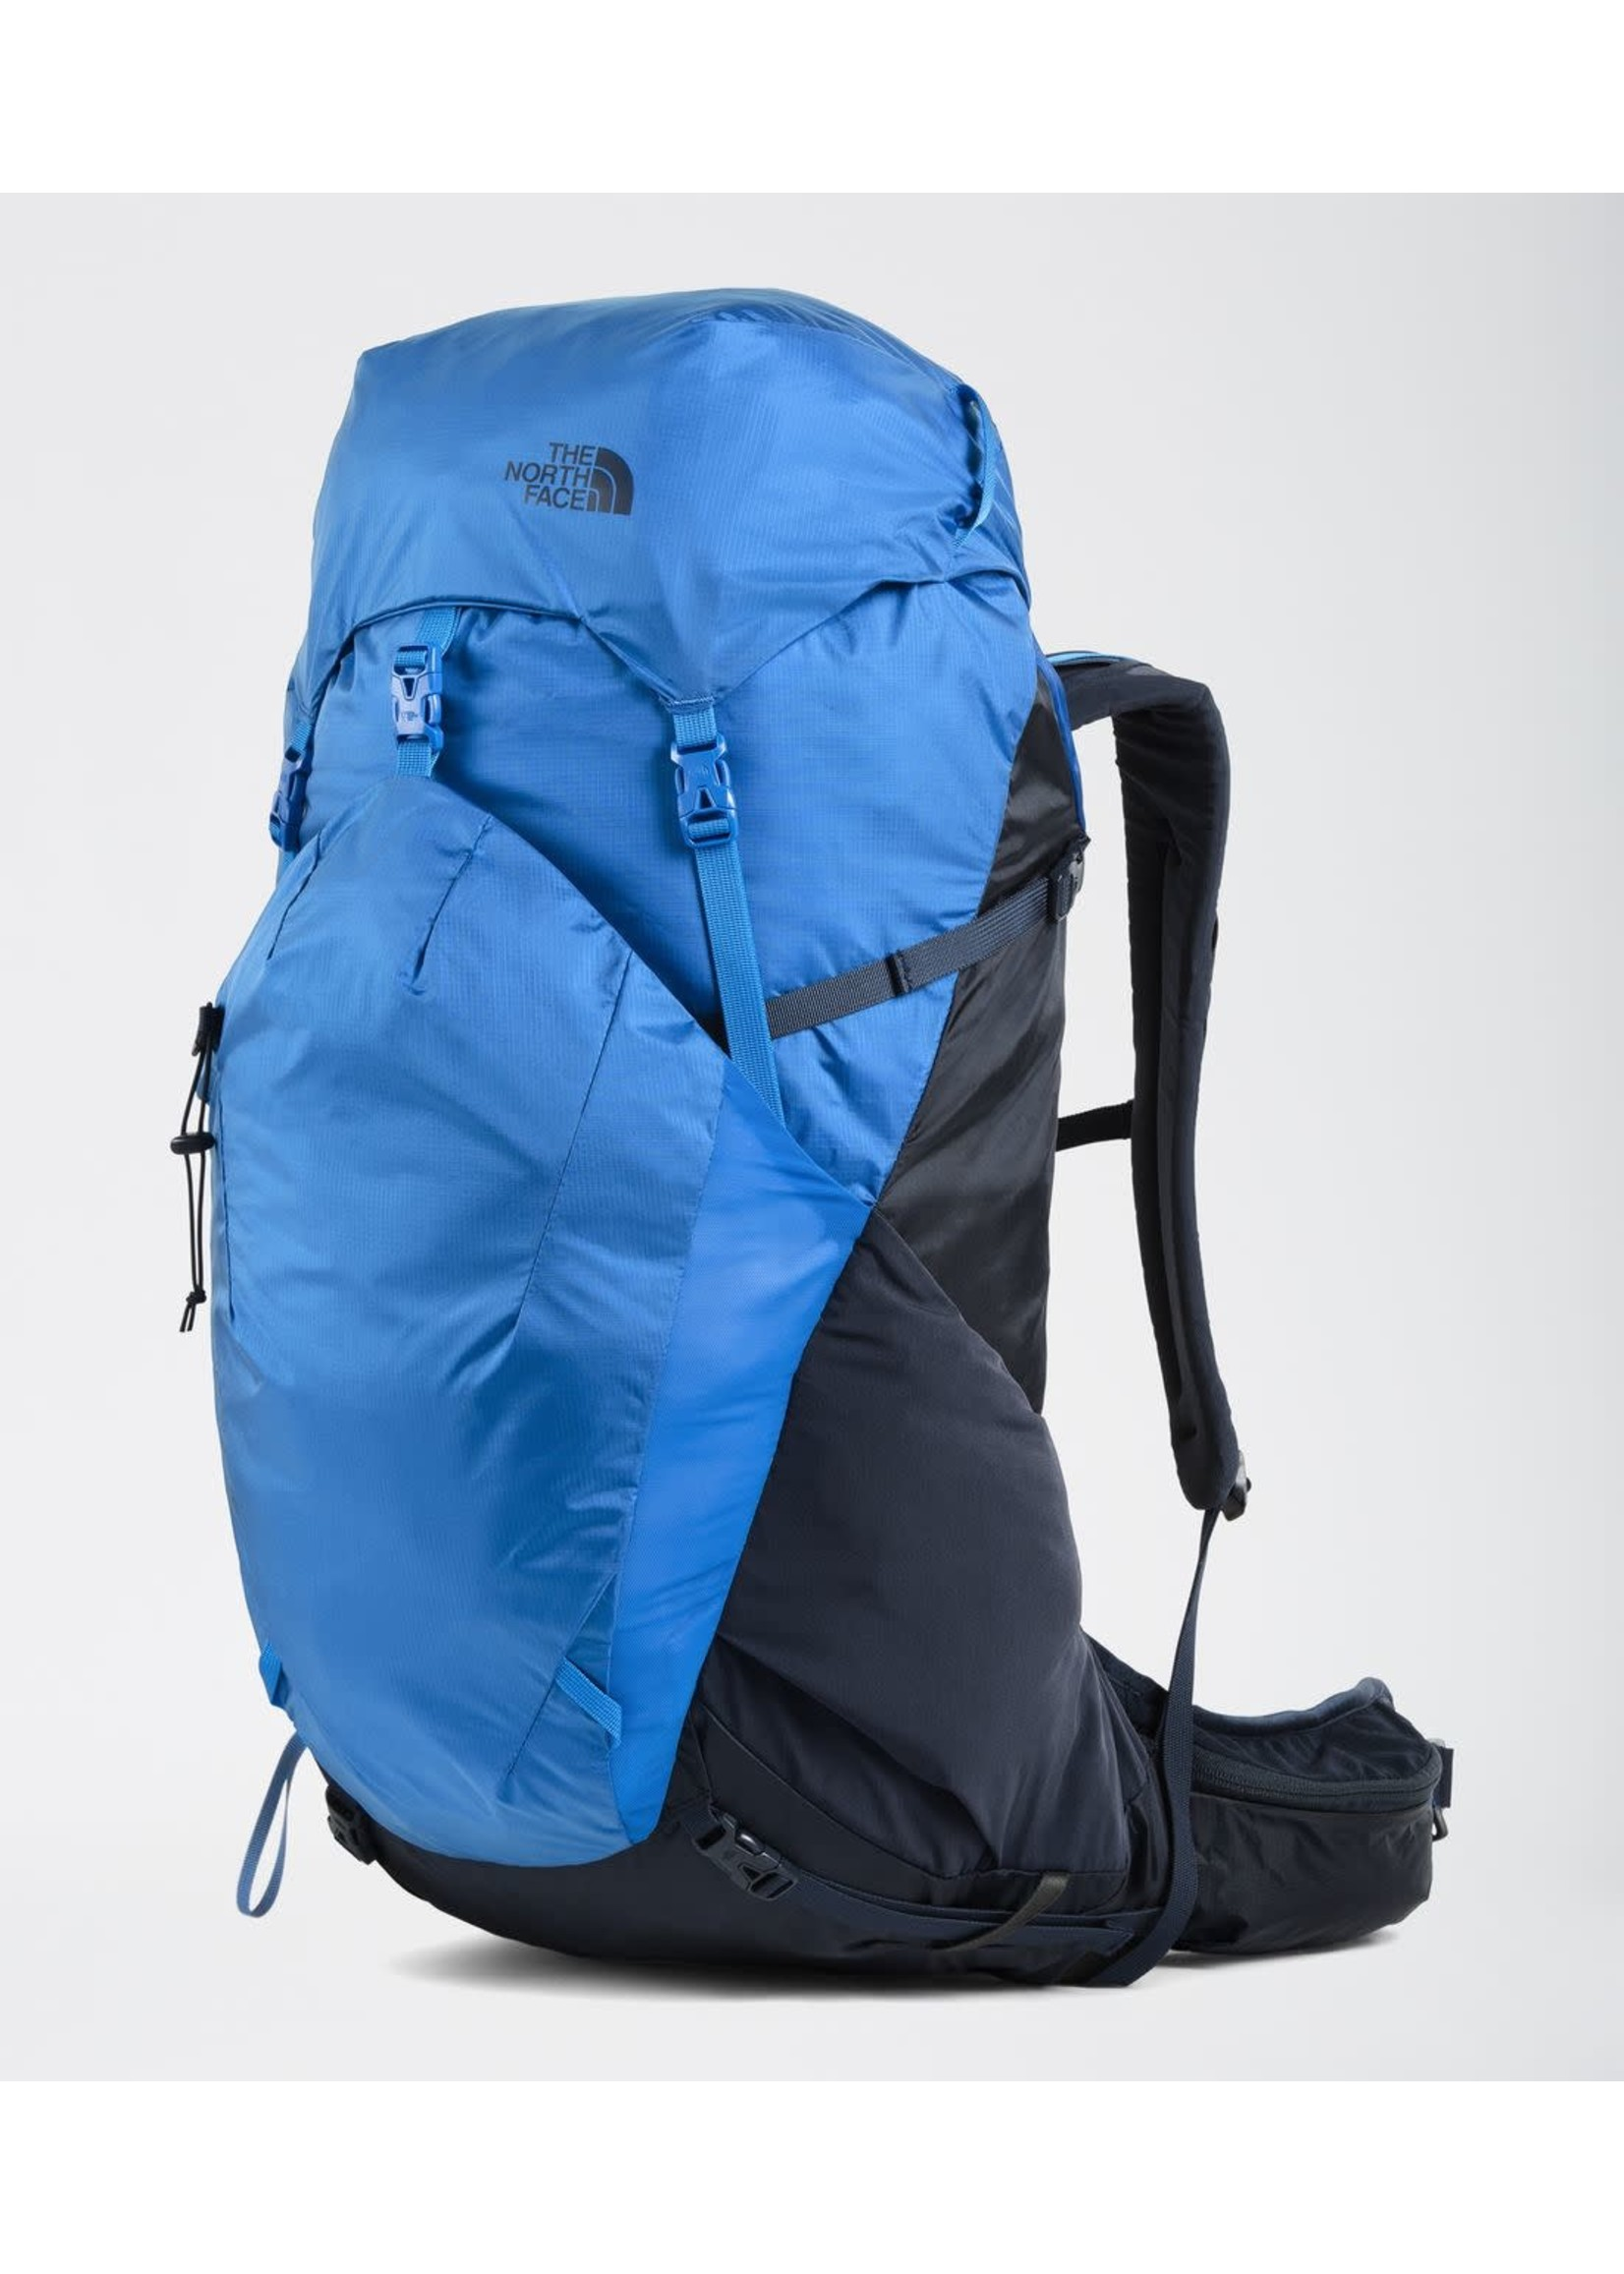 THE NORTH FACE Sac Hydra 38 / L-XL / Bleu